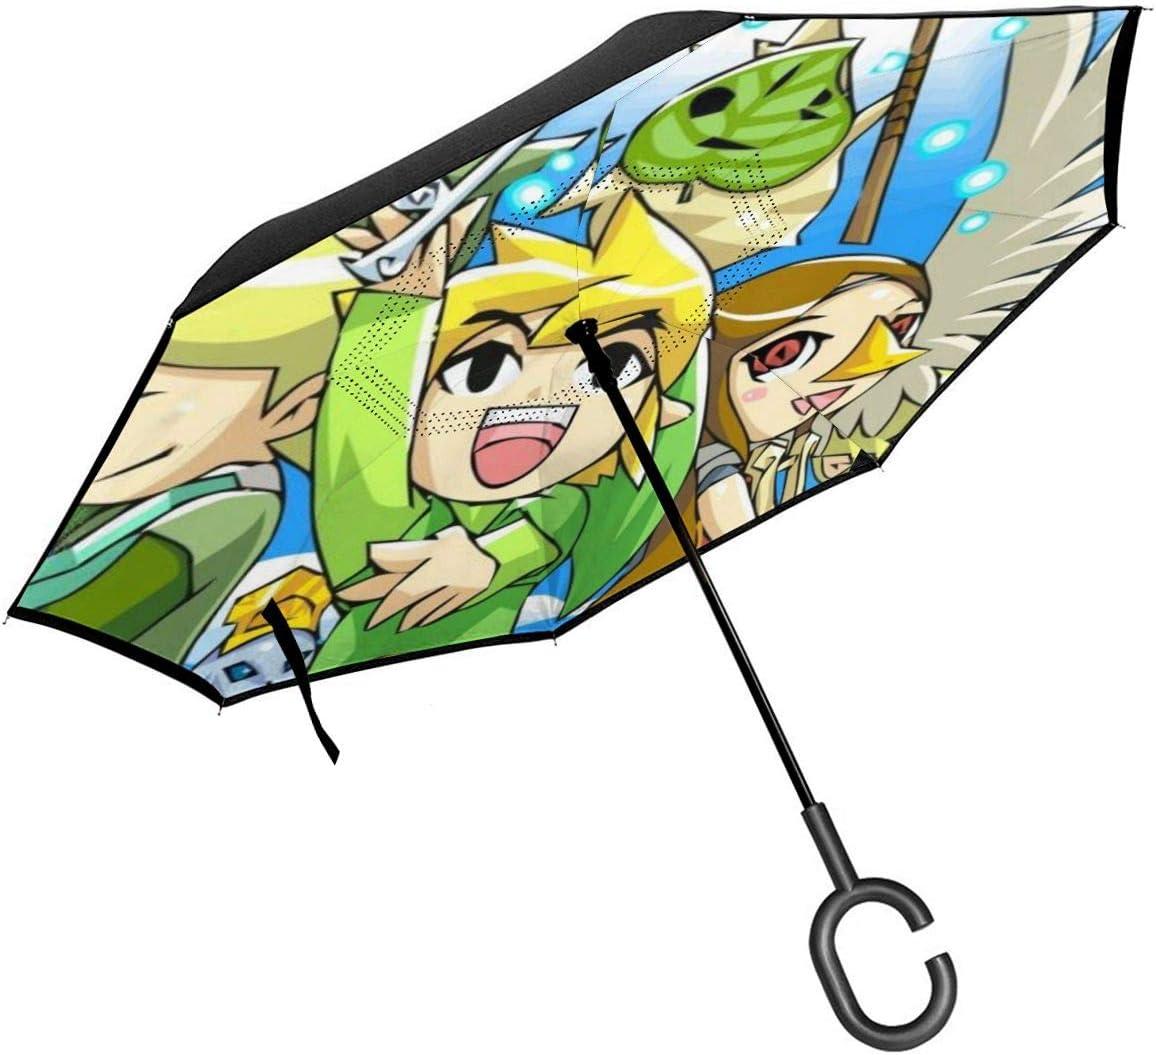 Game The Legend Of Zelda Car Reverse Umbrella With C-Shaped Handle UV Protection Inverted Folding Umbrellas Windproof And Rainproof Double Folding Inverted Umbrella